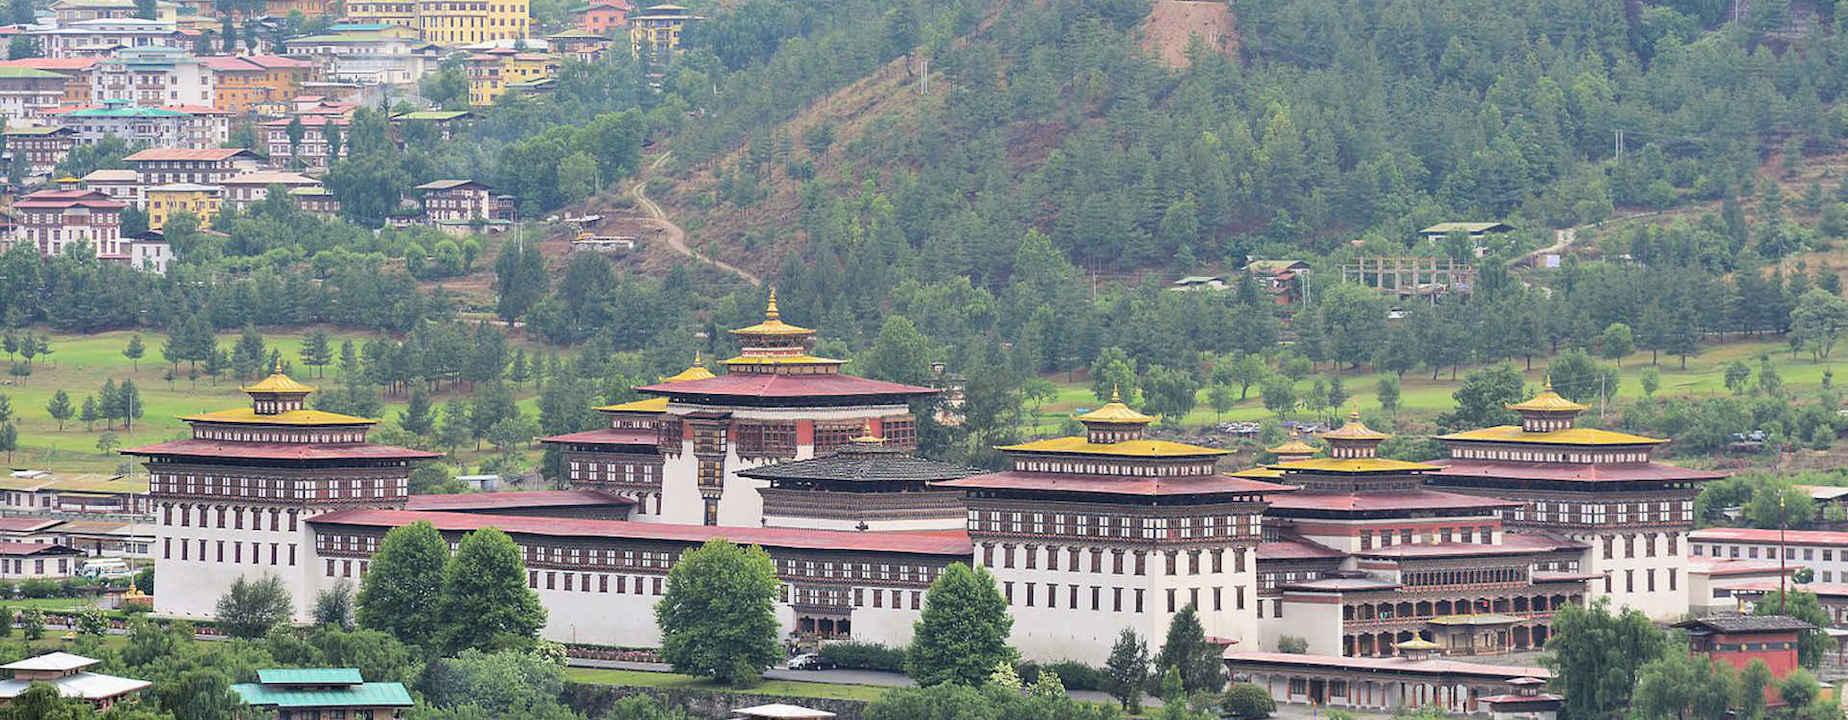 9 day Bhutan Cultural Premium Private Safari (business class flight from Bangkok included) Shoulder Season